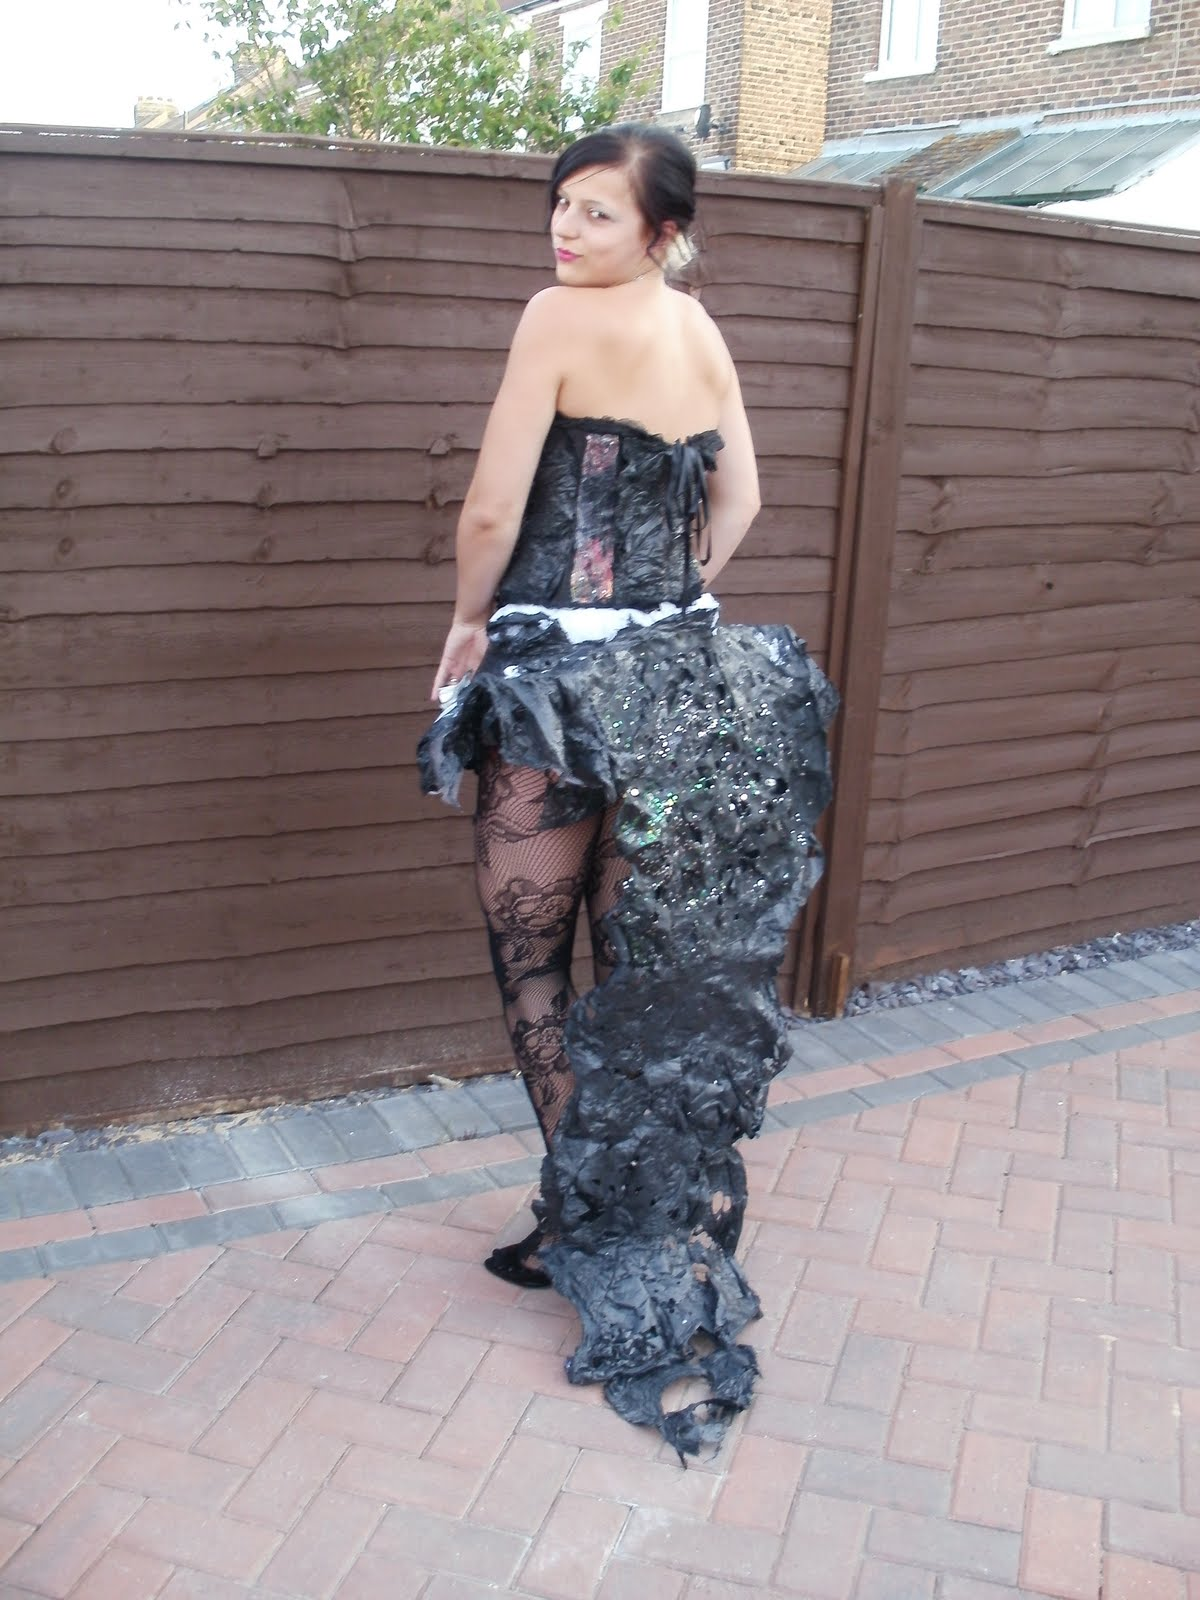 Black bin liner dresses